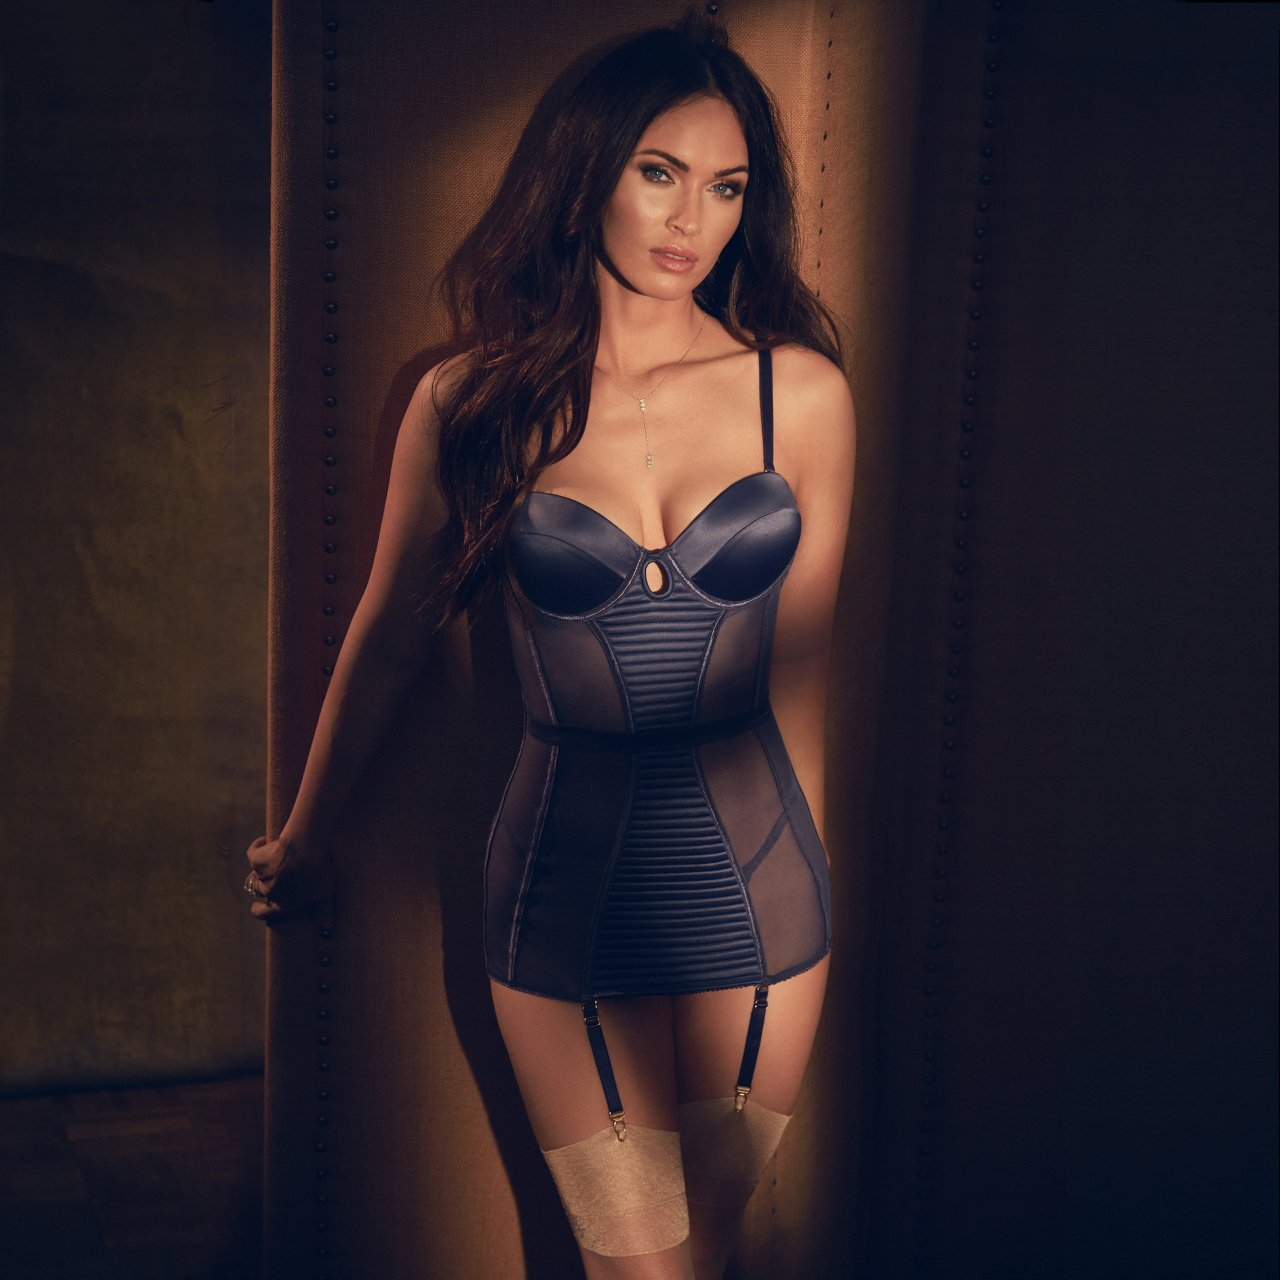 Fake porn pics on models